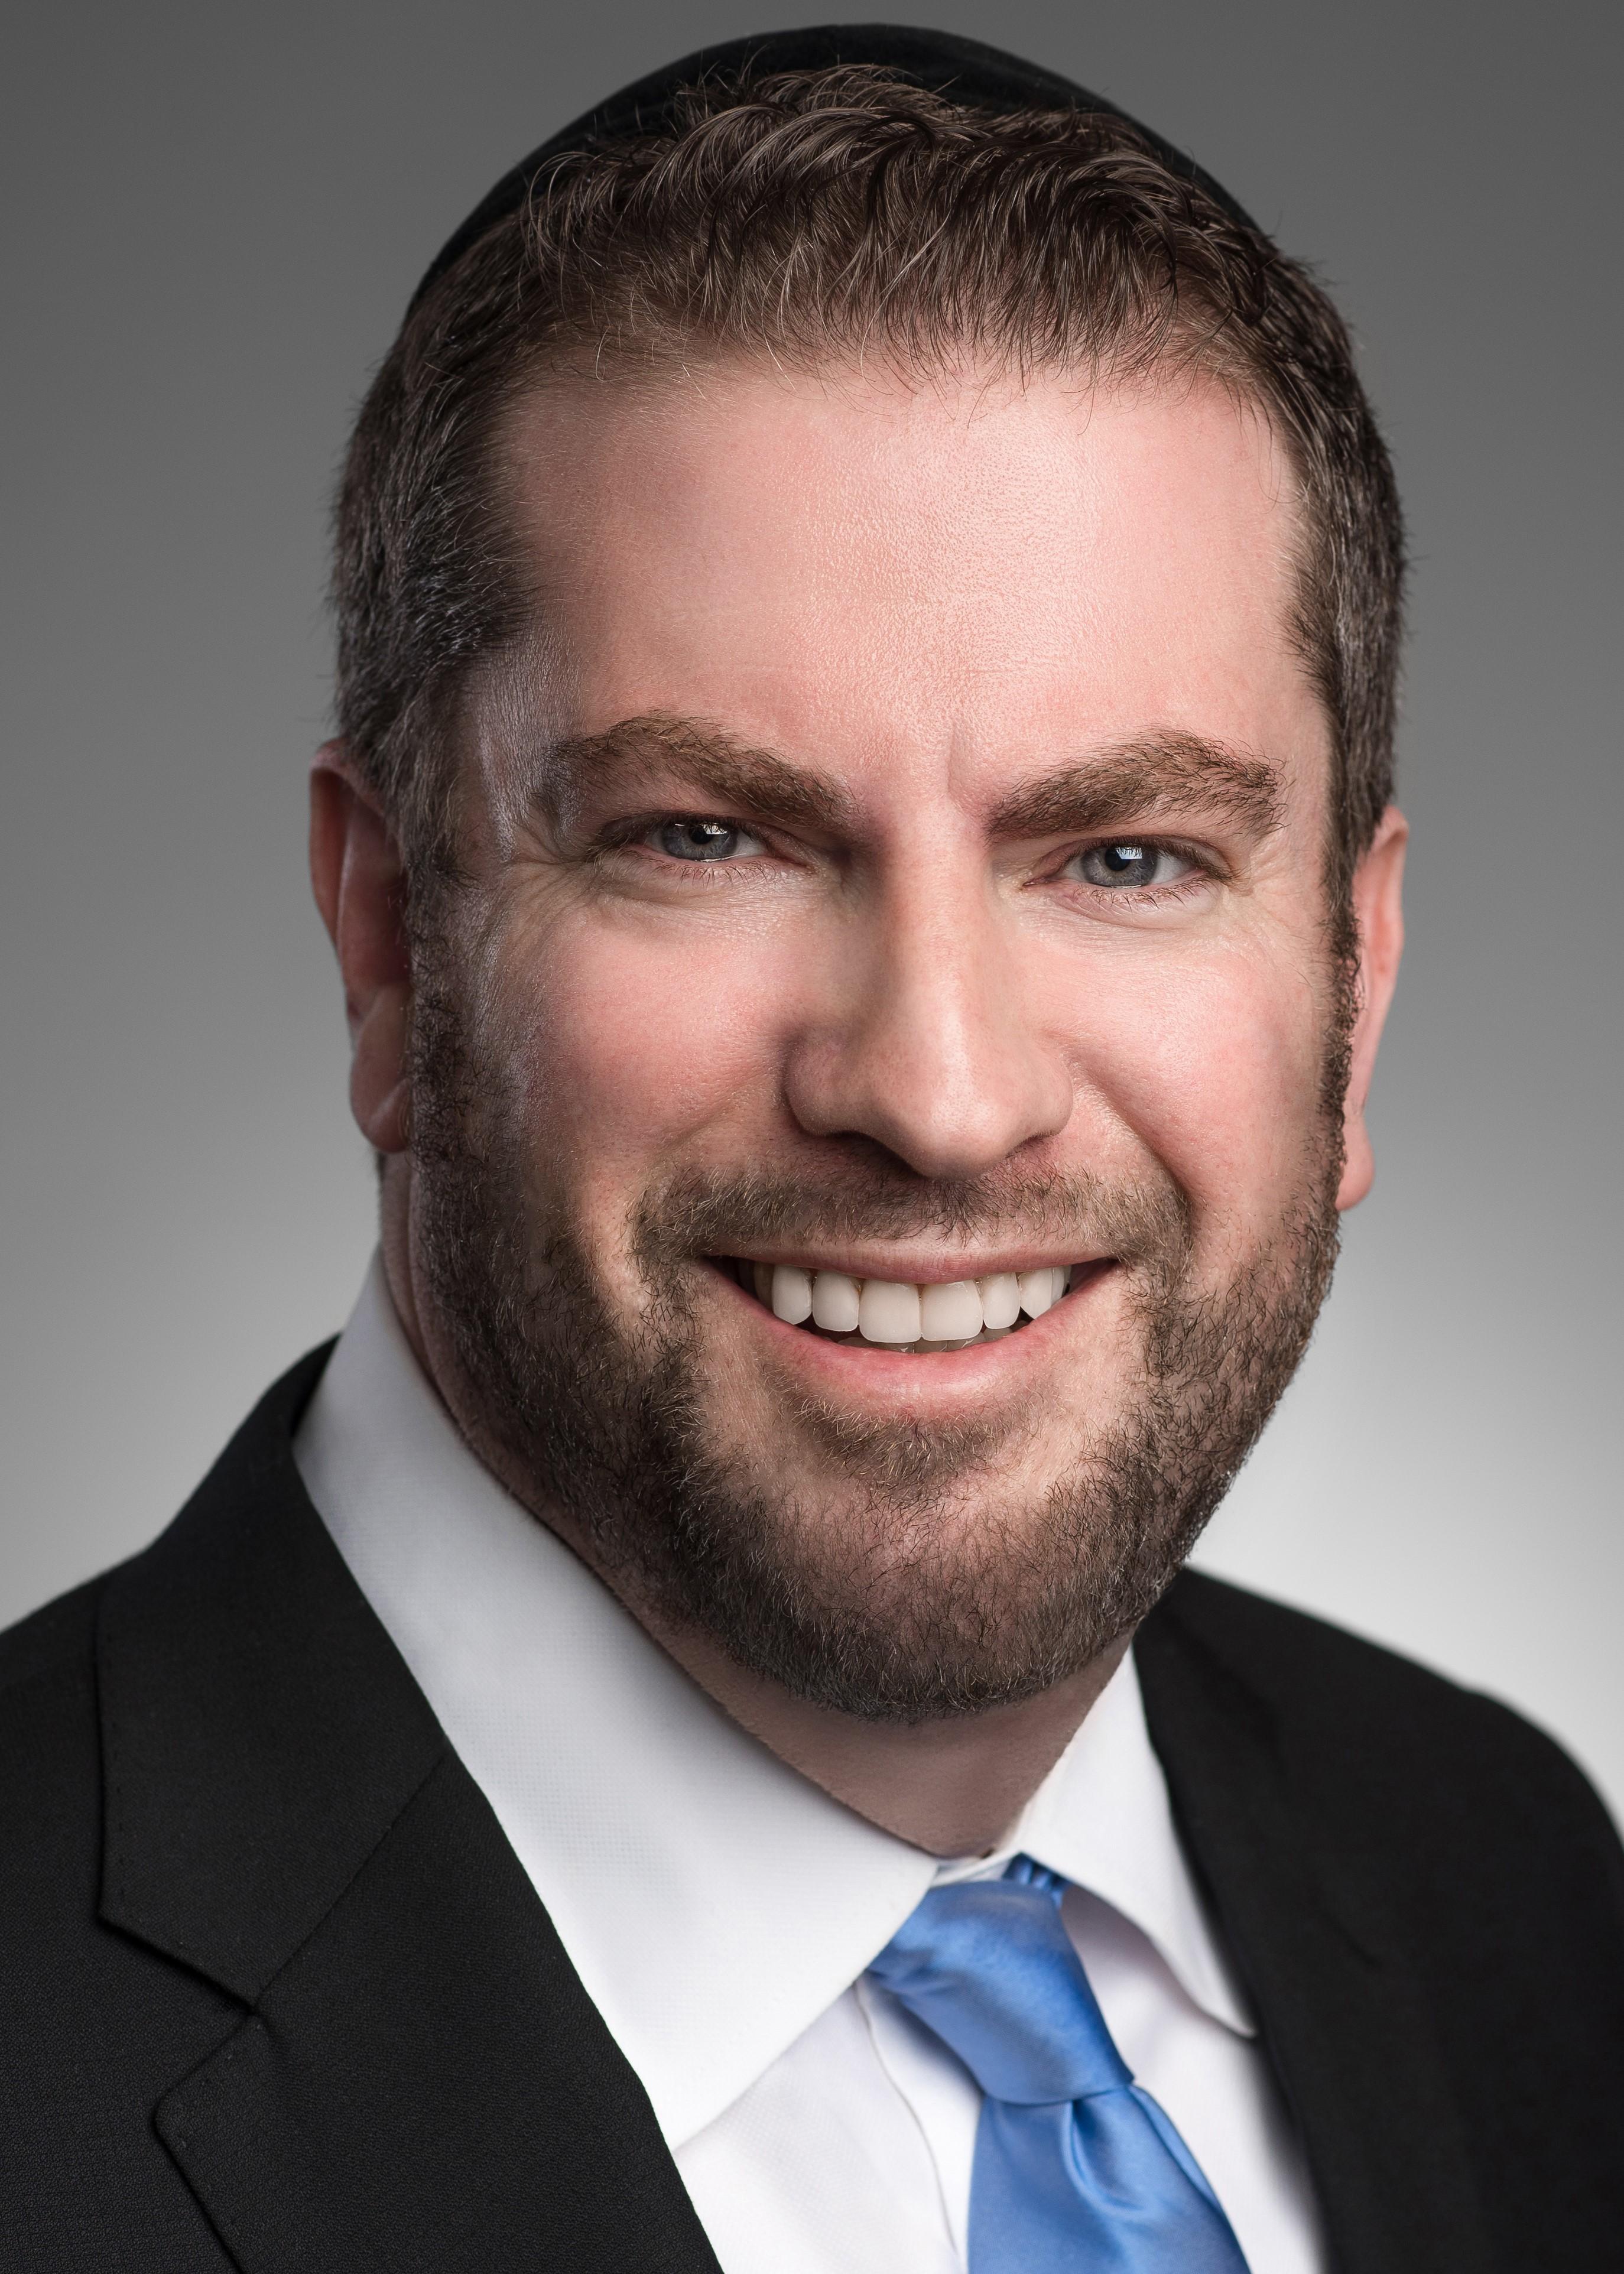 Dr. David Lieberman